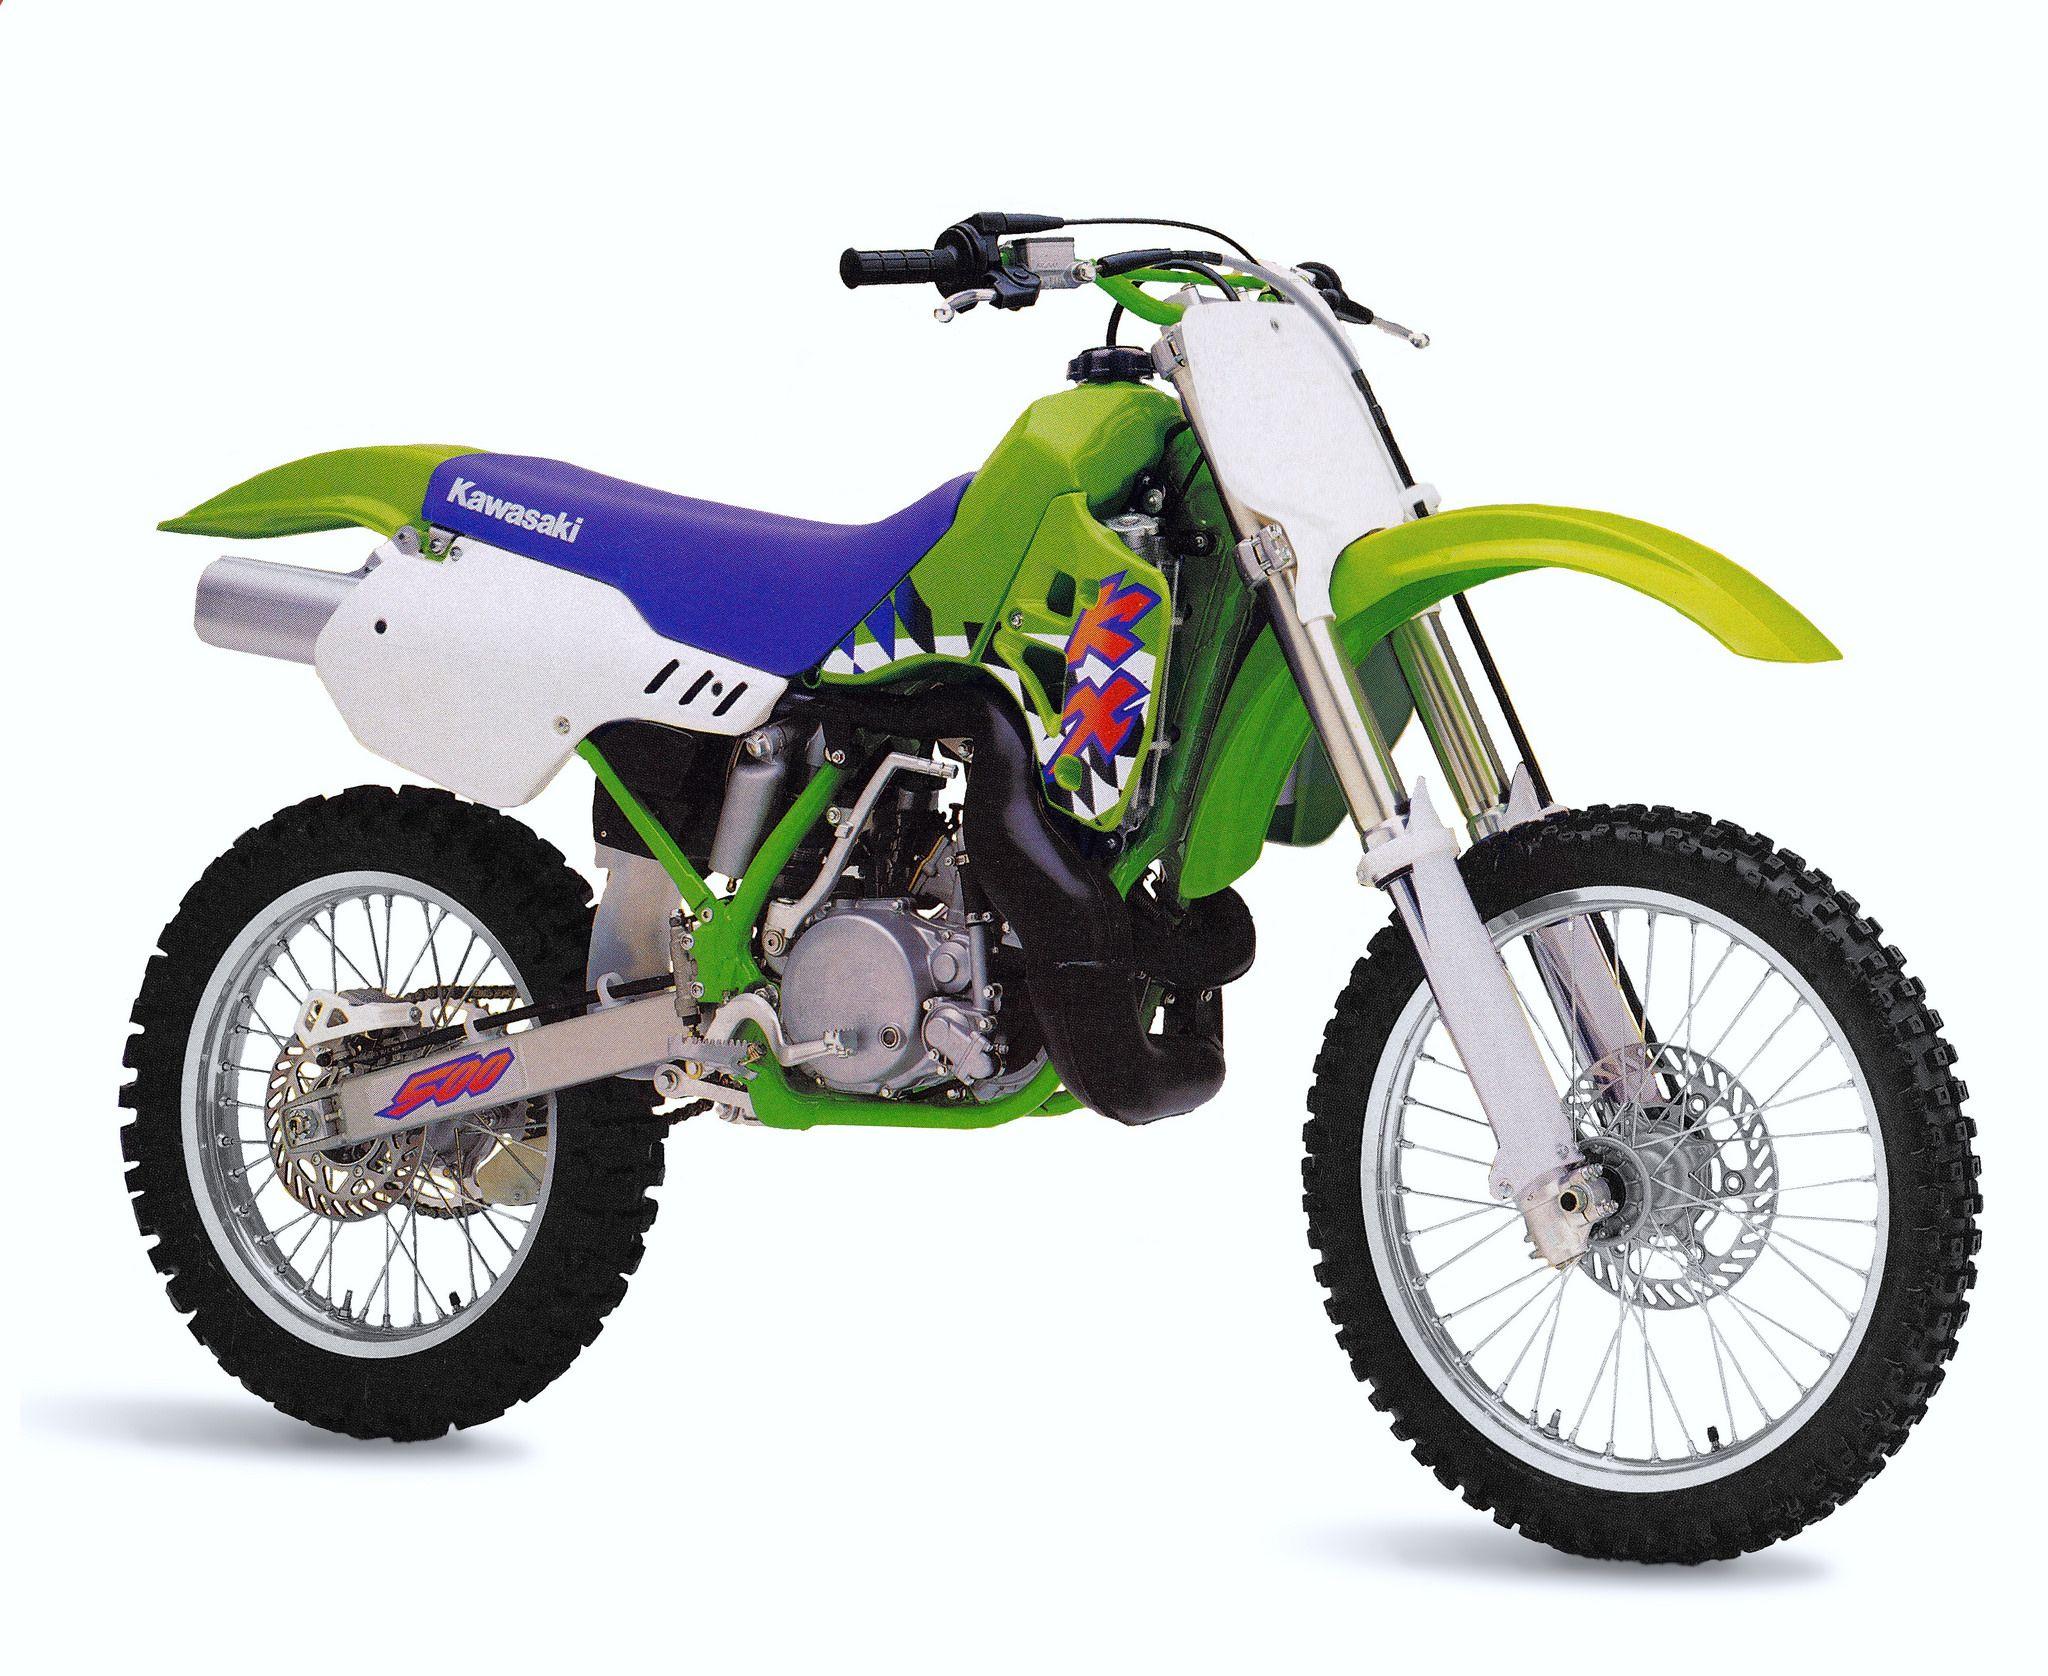 1997 kawasaki kx500 dirt bikes motorrad. Black Bedroom Furniture Sets. Home Design Ideas